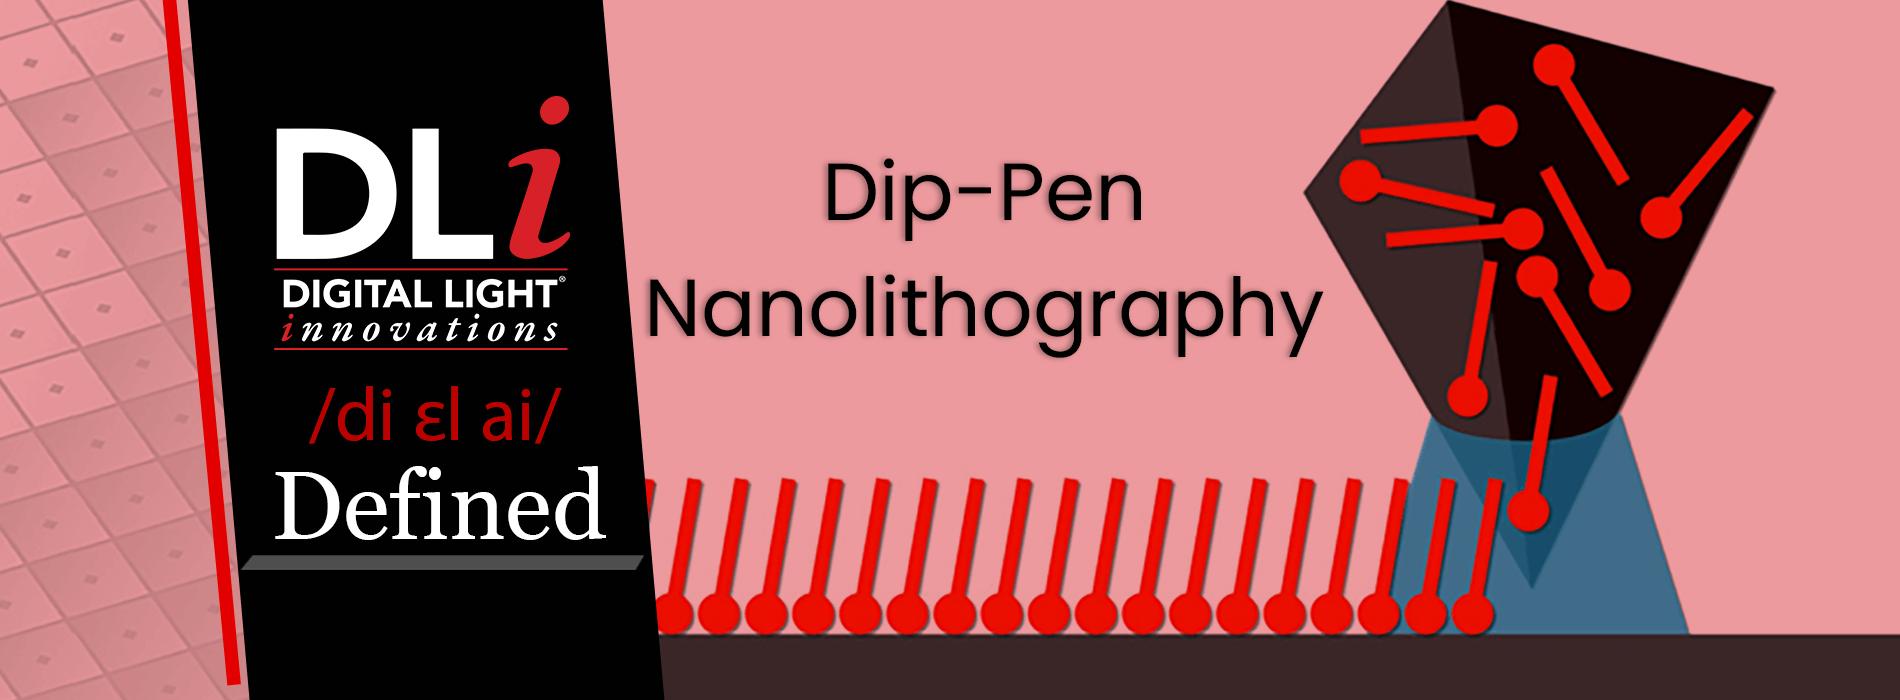 DLi Defined: Dip-Pen Nanolithography